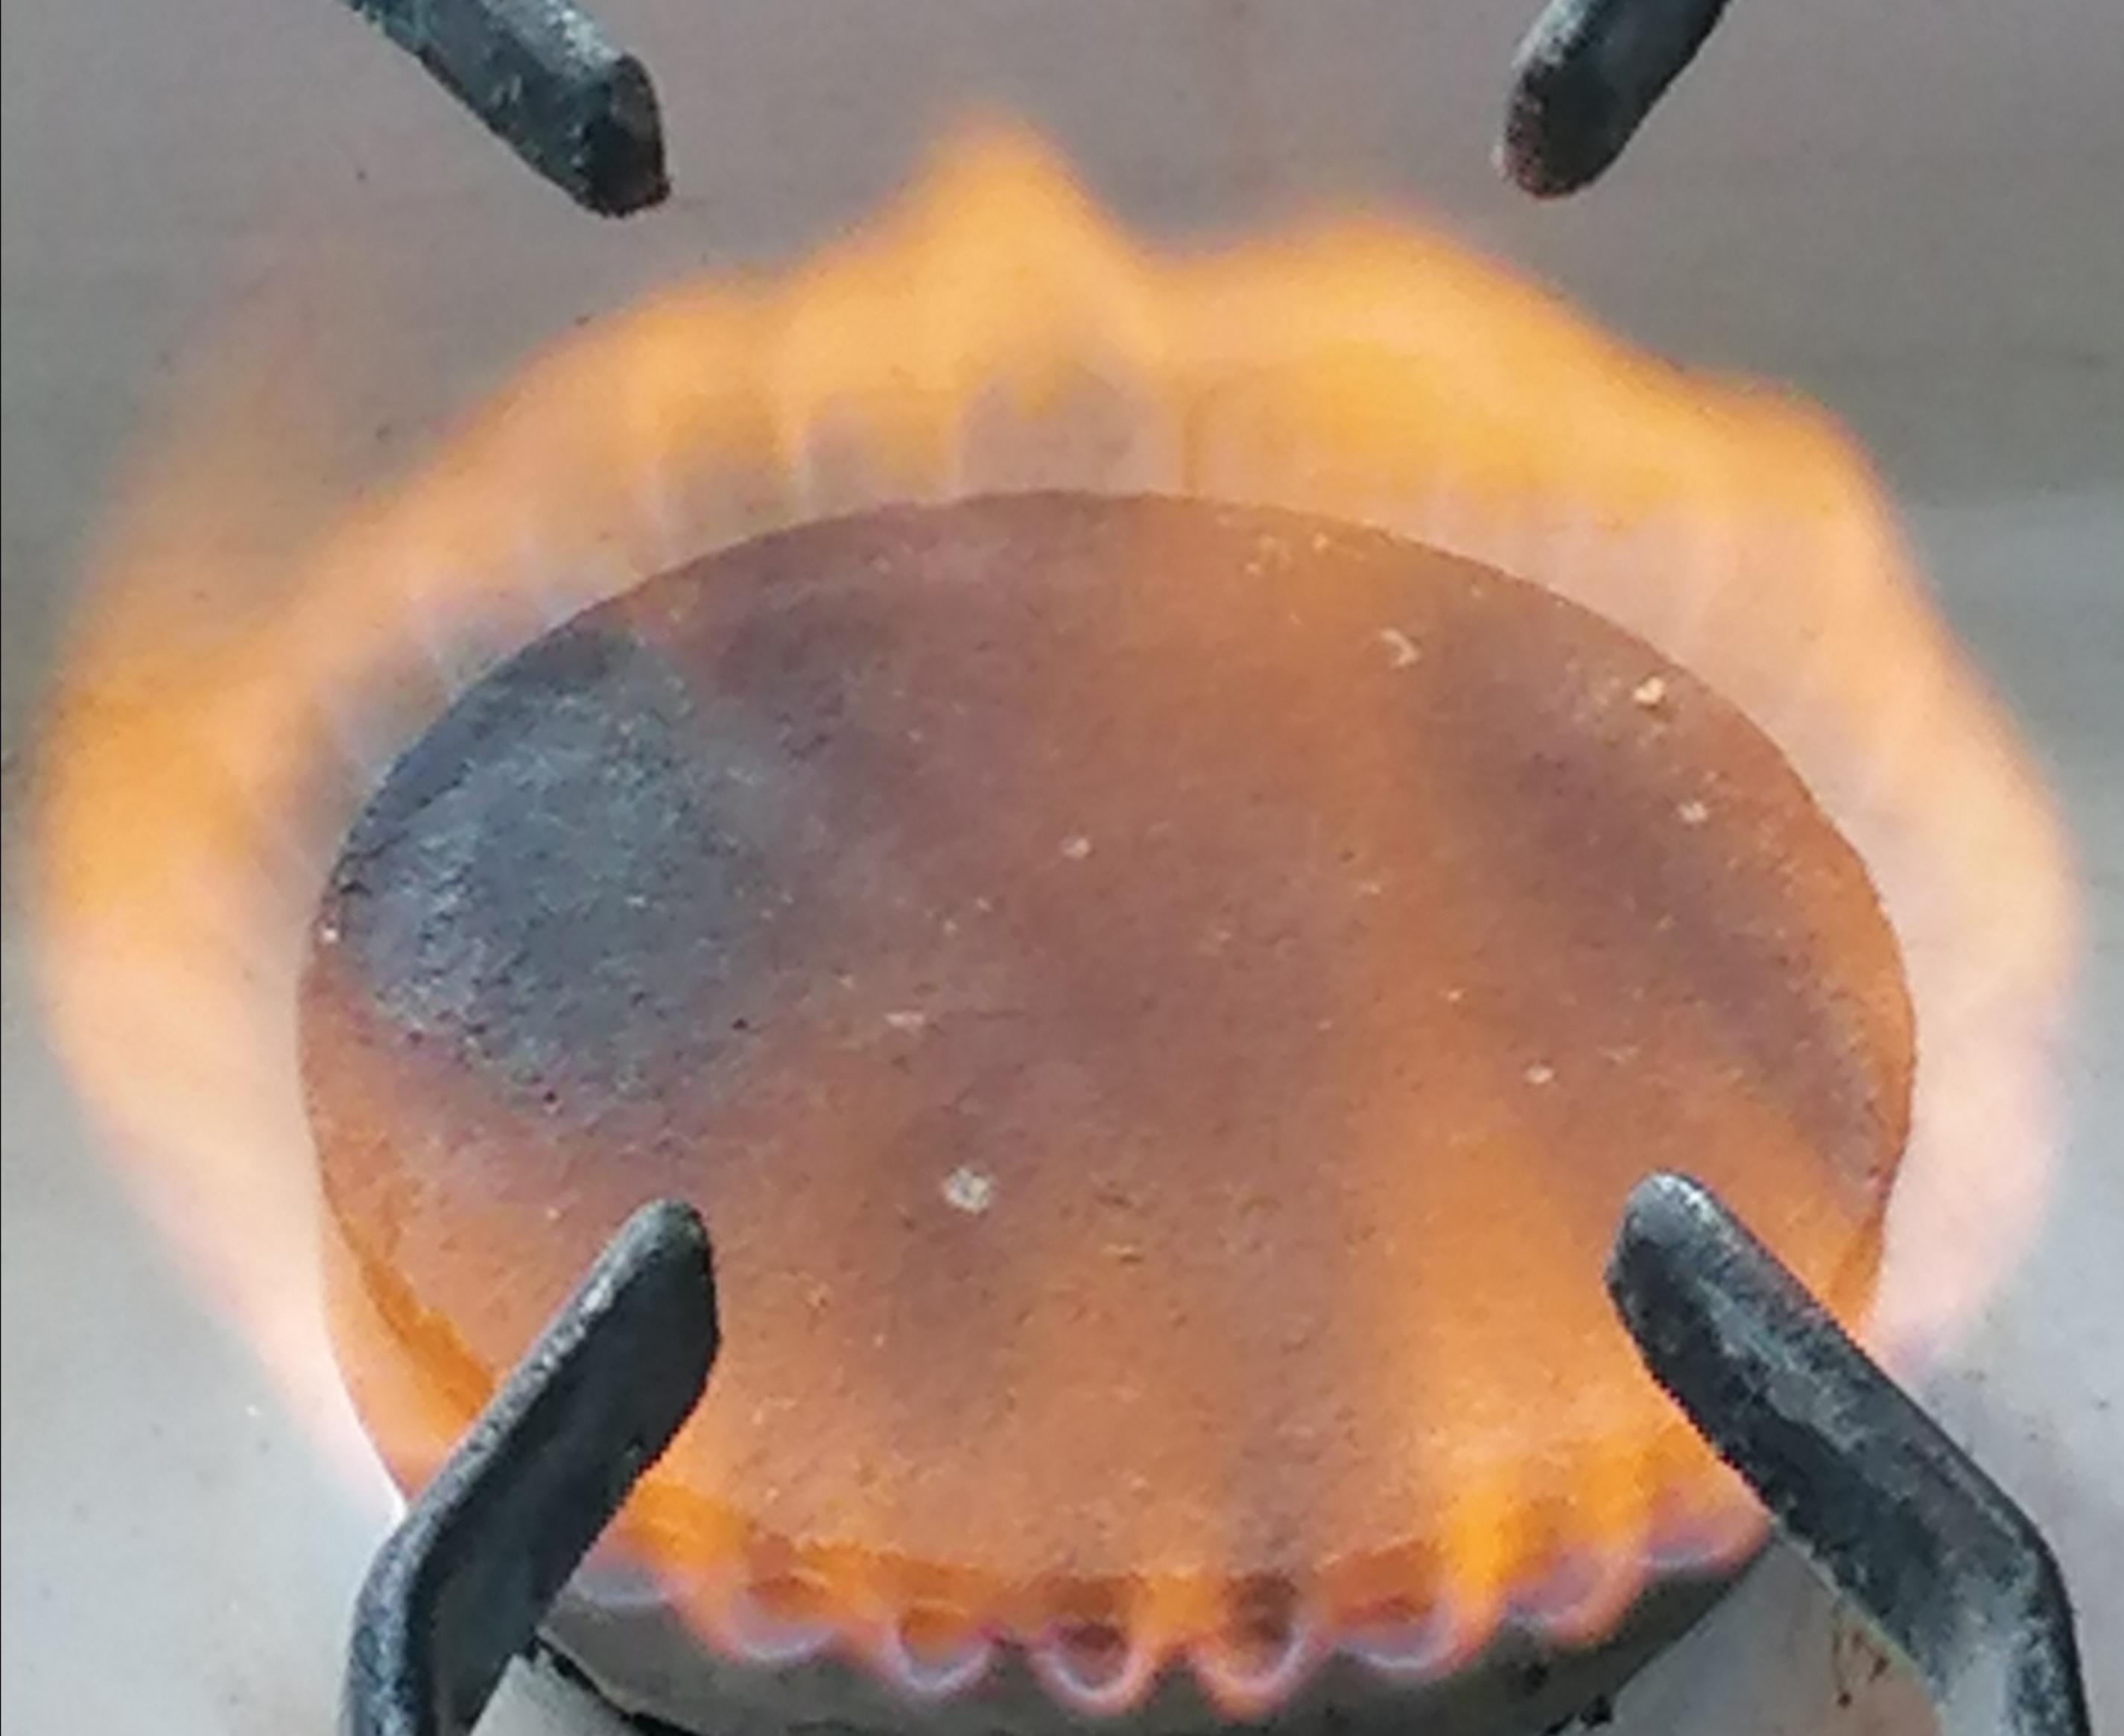 Газова плита дає помаранчеве полум'я – не отруїться чадним газом!